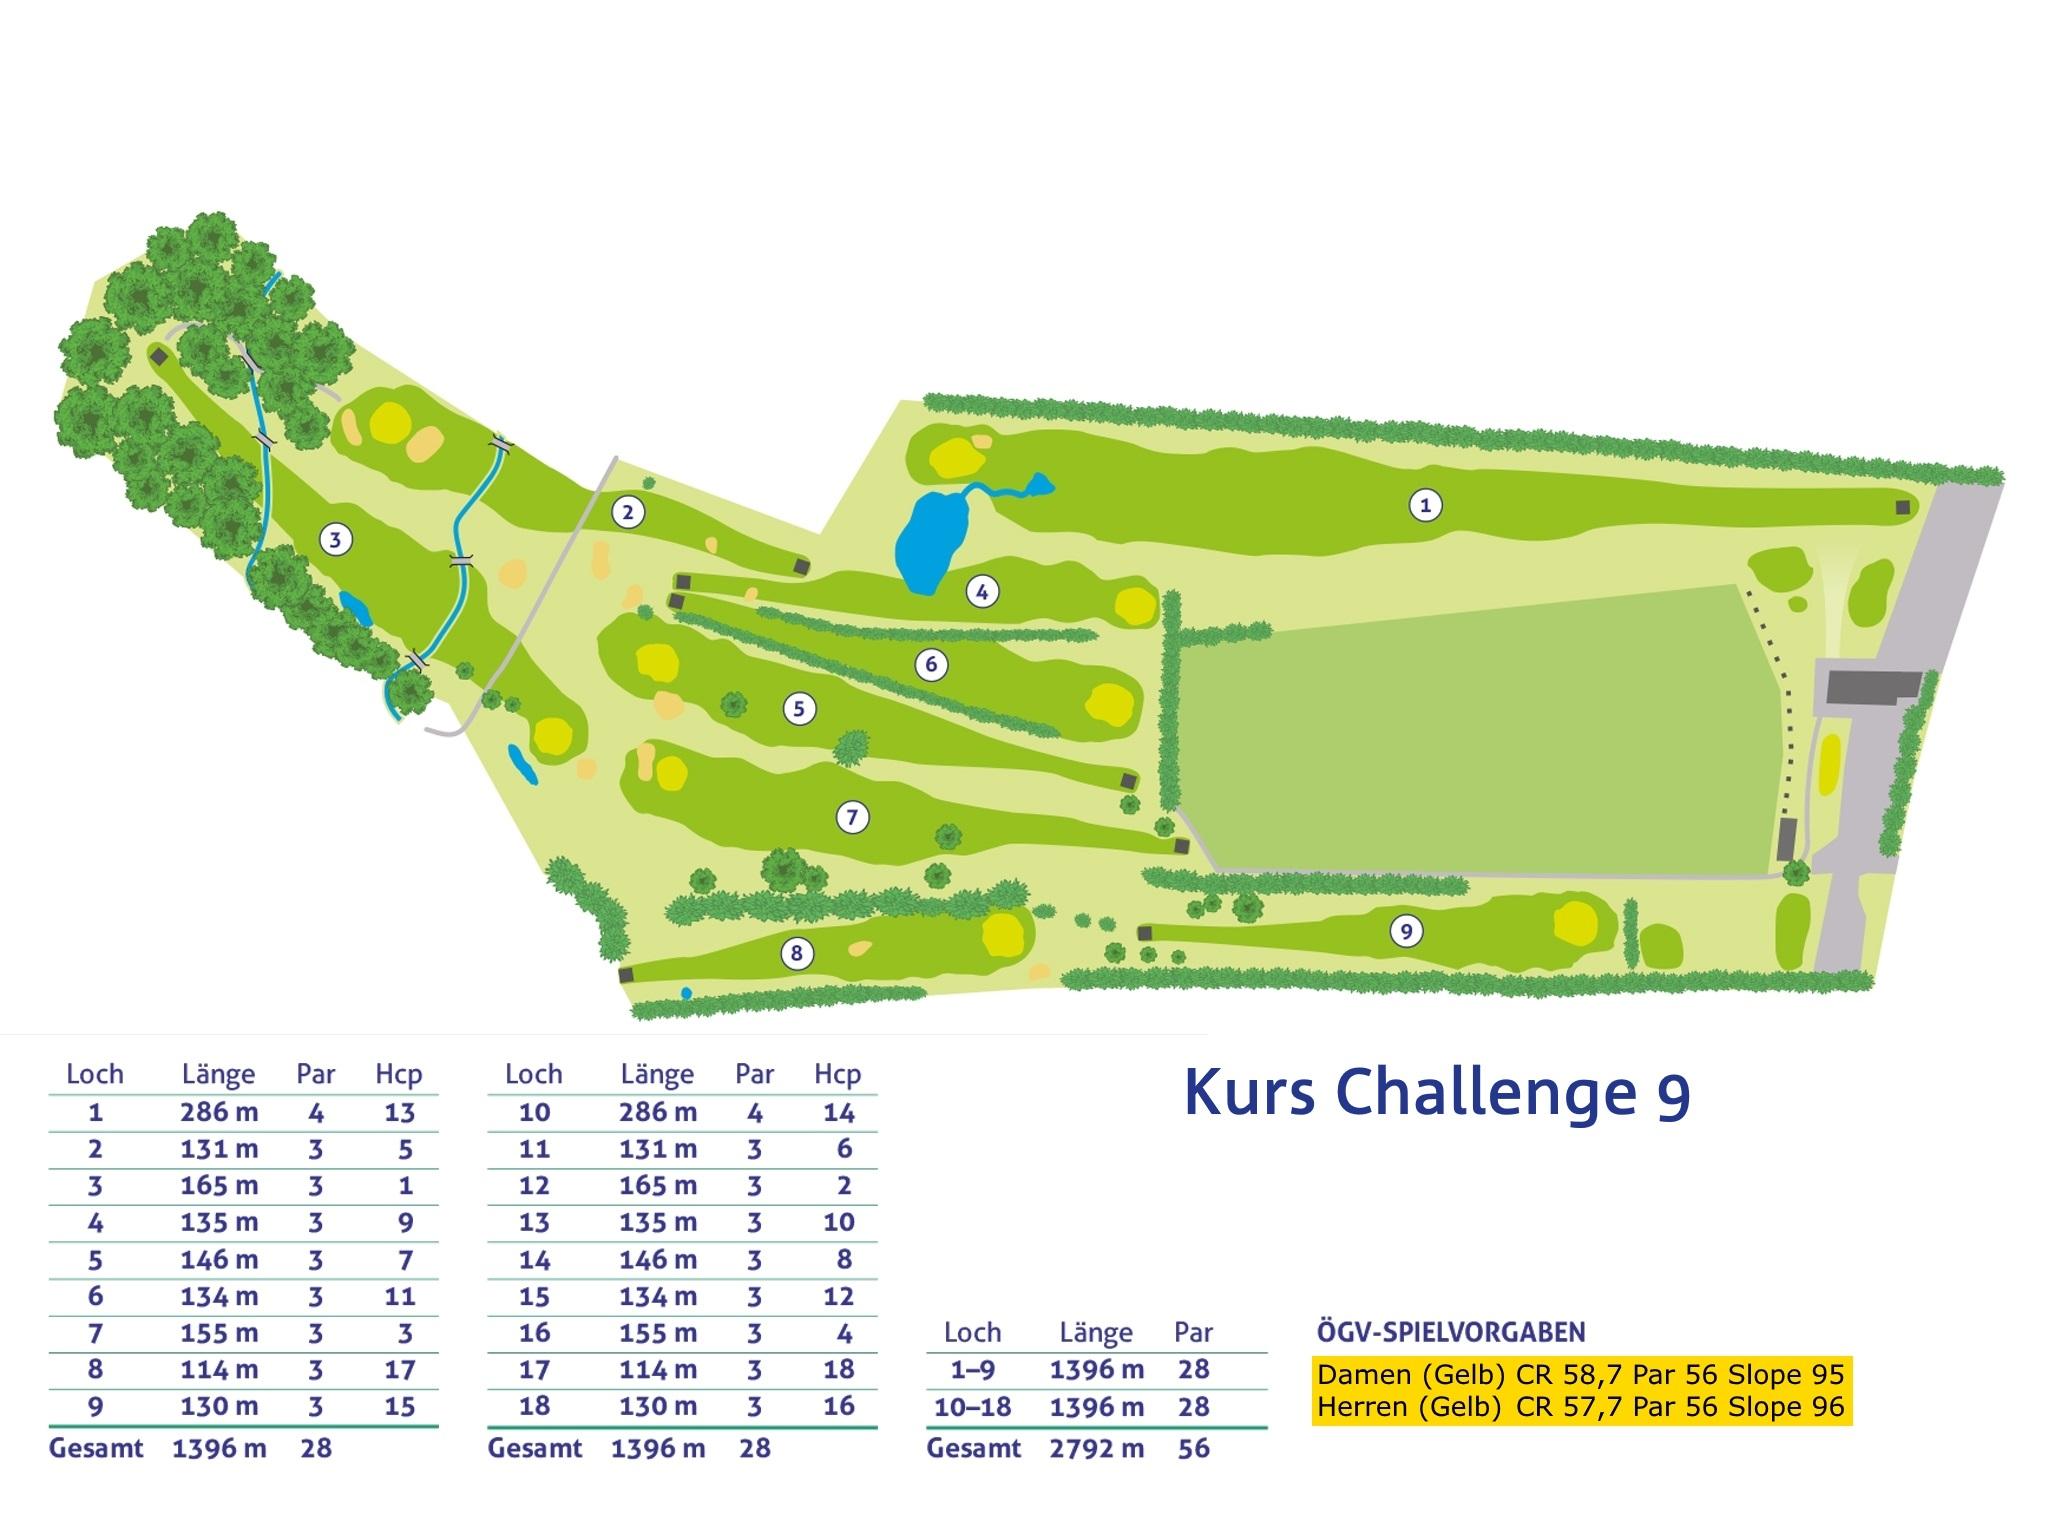 Kurs Challenge 9 - Plan